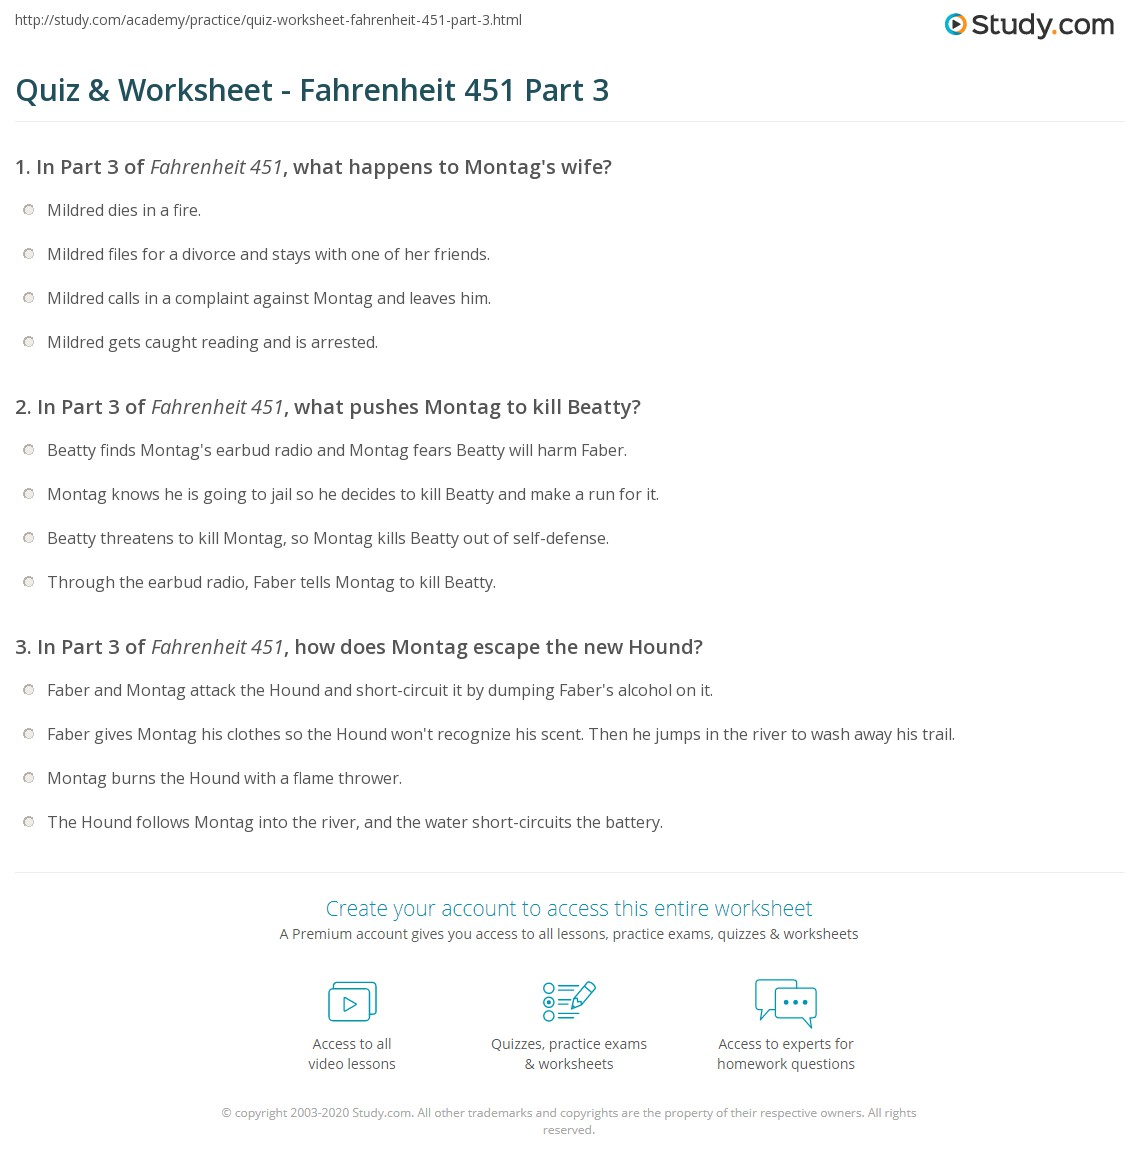 https://study.com/academy/practice/quiz-worksheet-fahrenheit-451-part-3.jpg